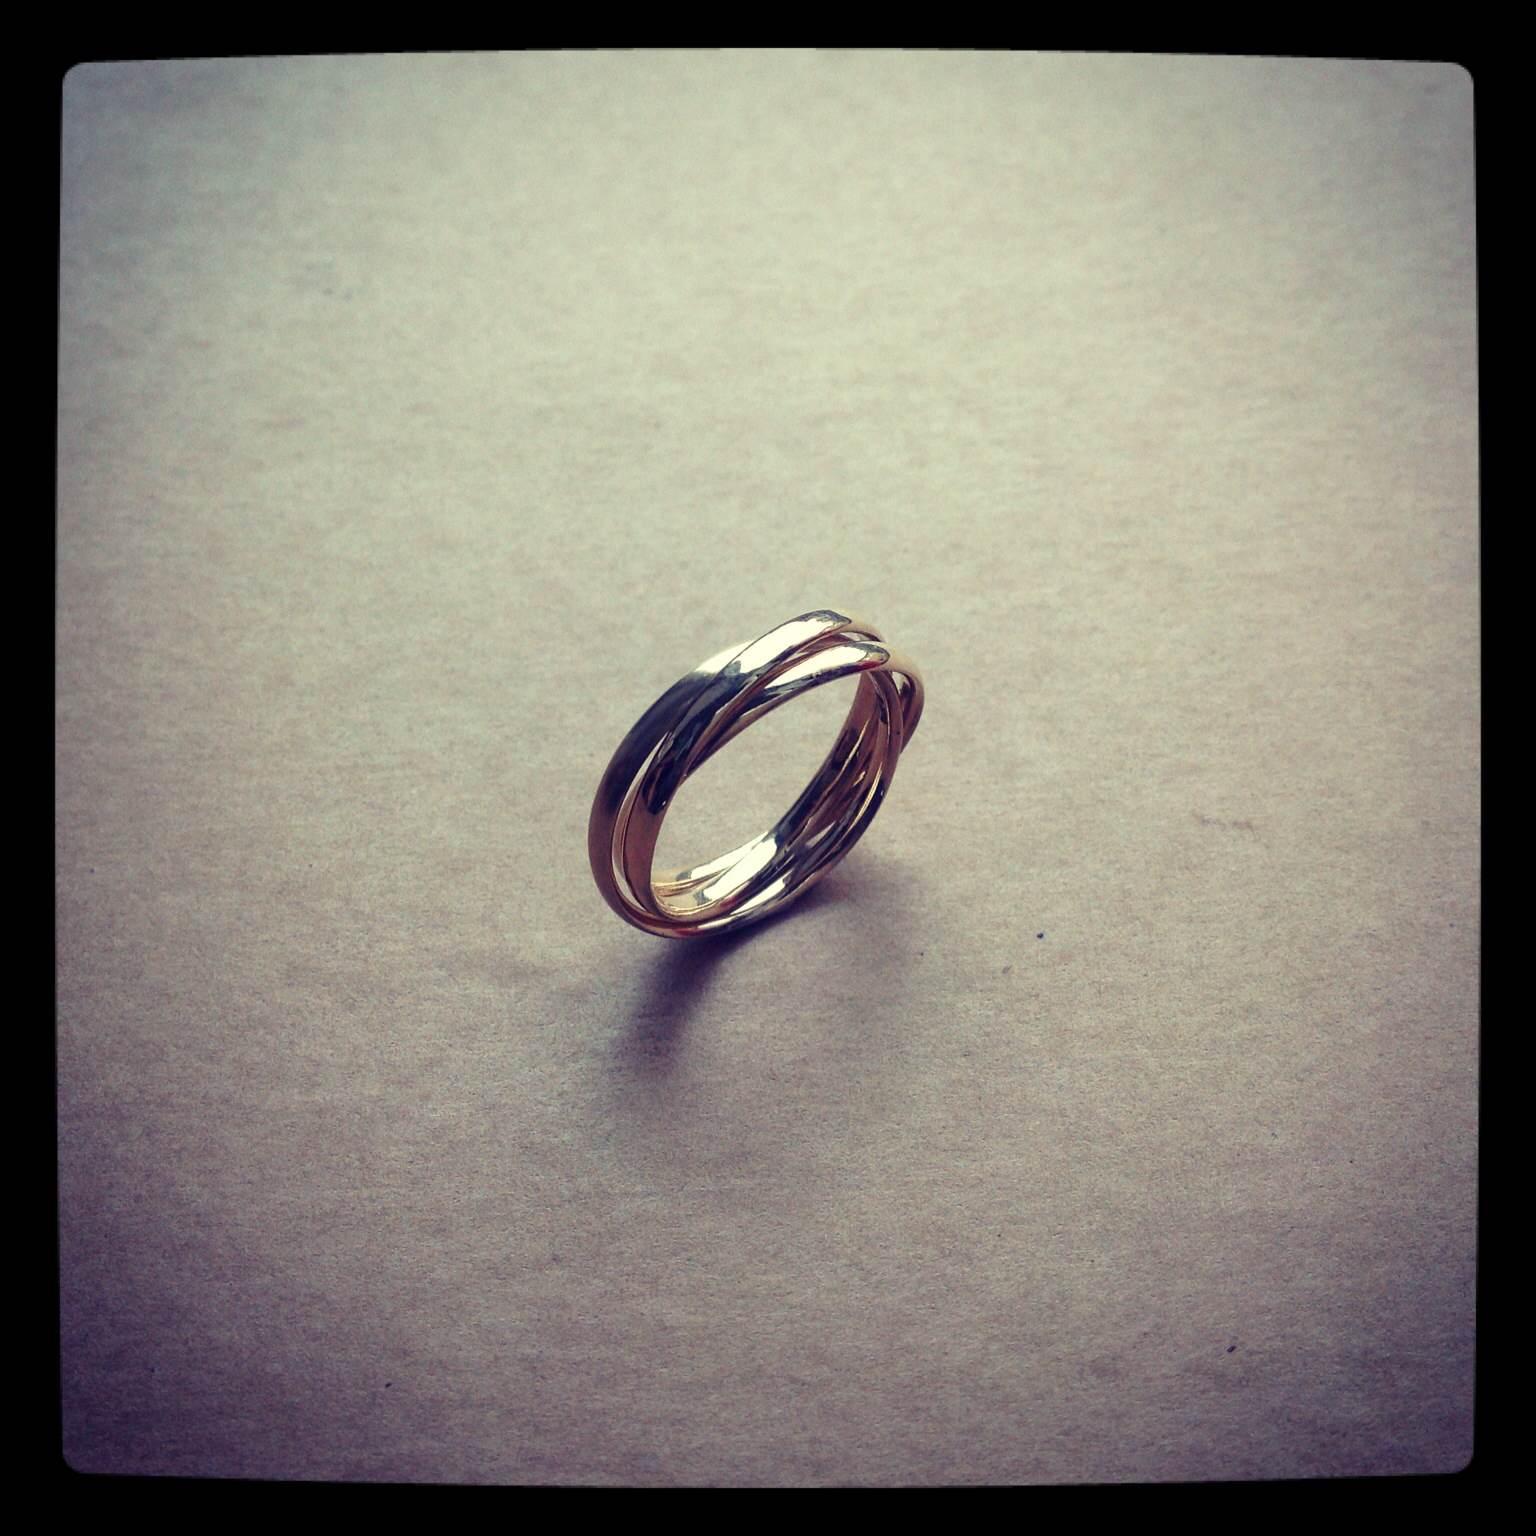 Gold Russian wedding ring